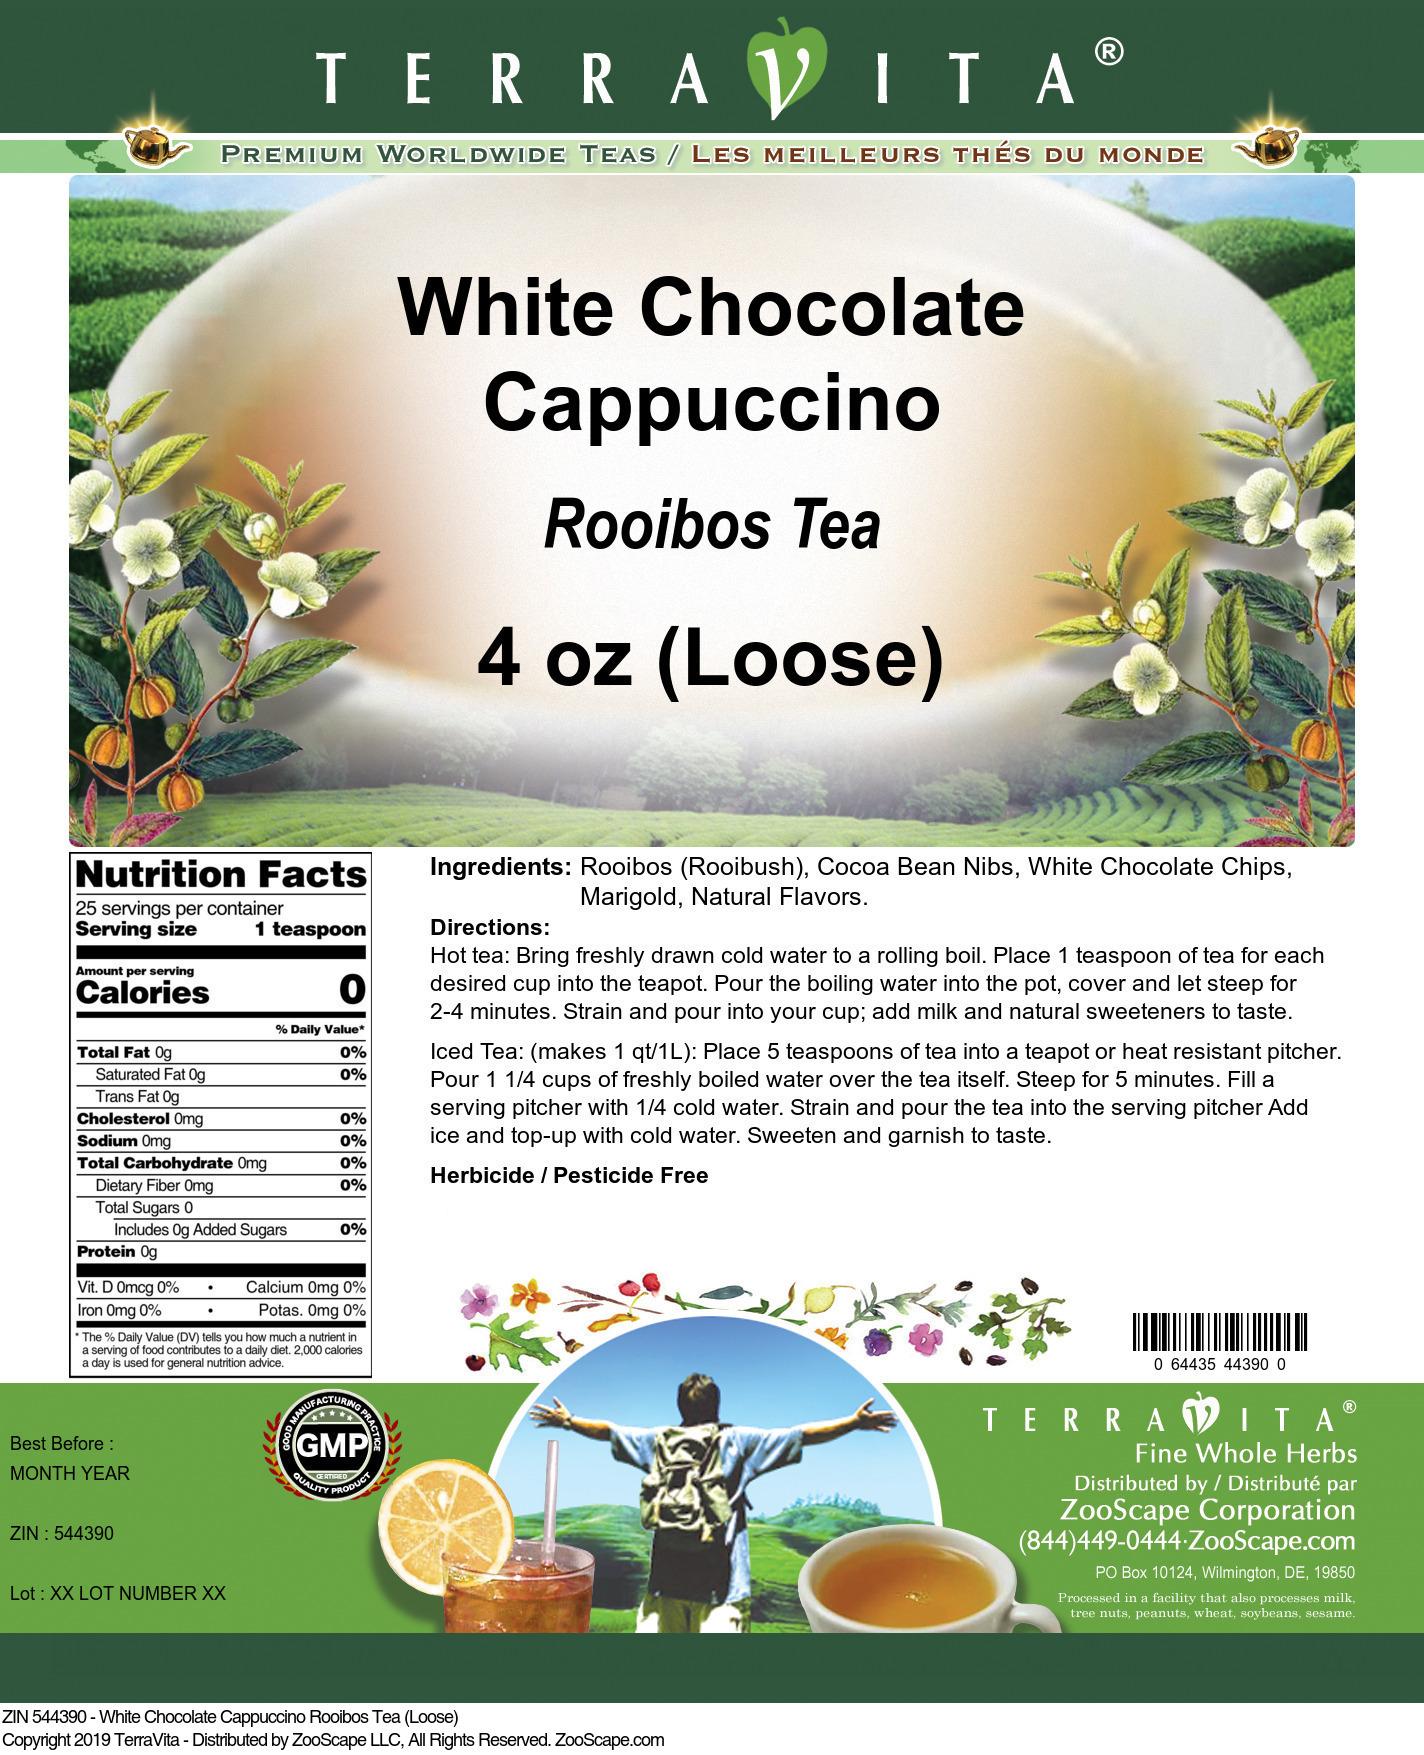 White Chocolate Cappuccino Rooibos Tea (Loose)